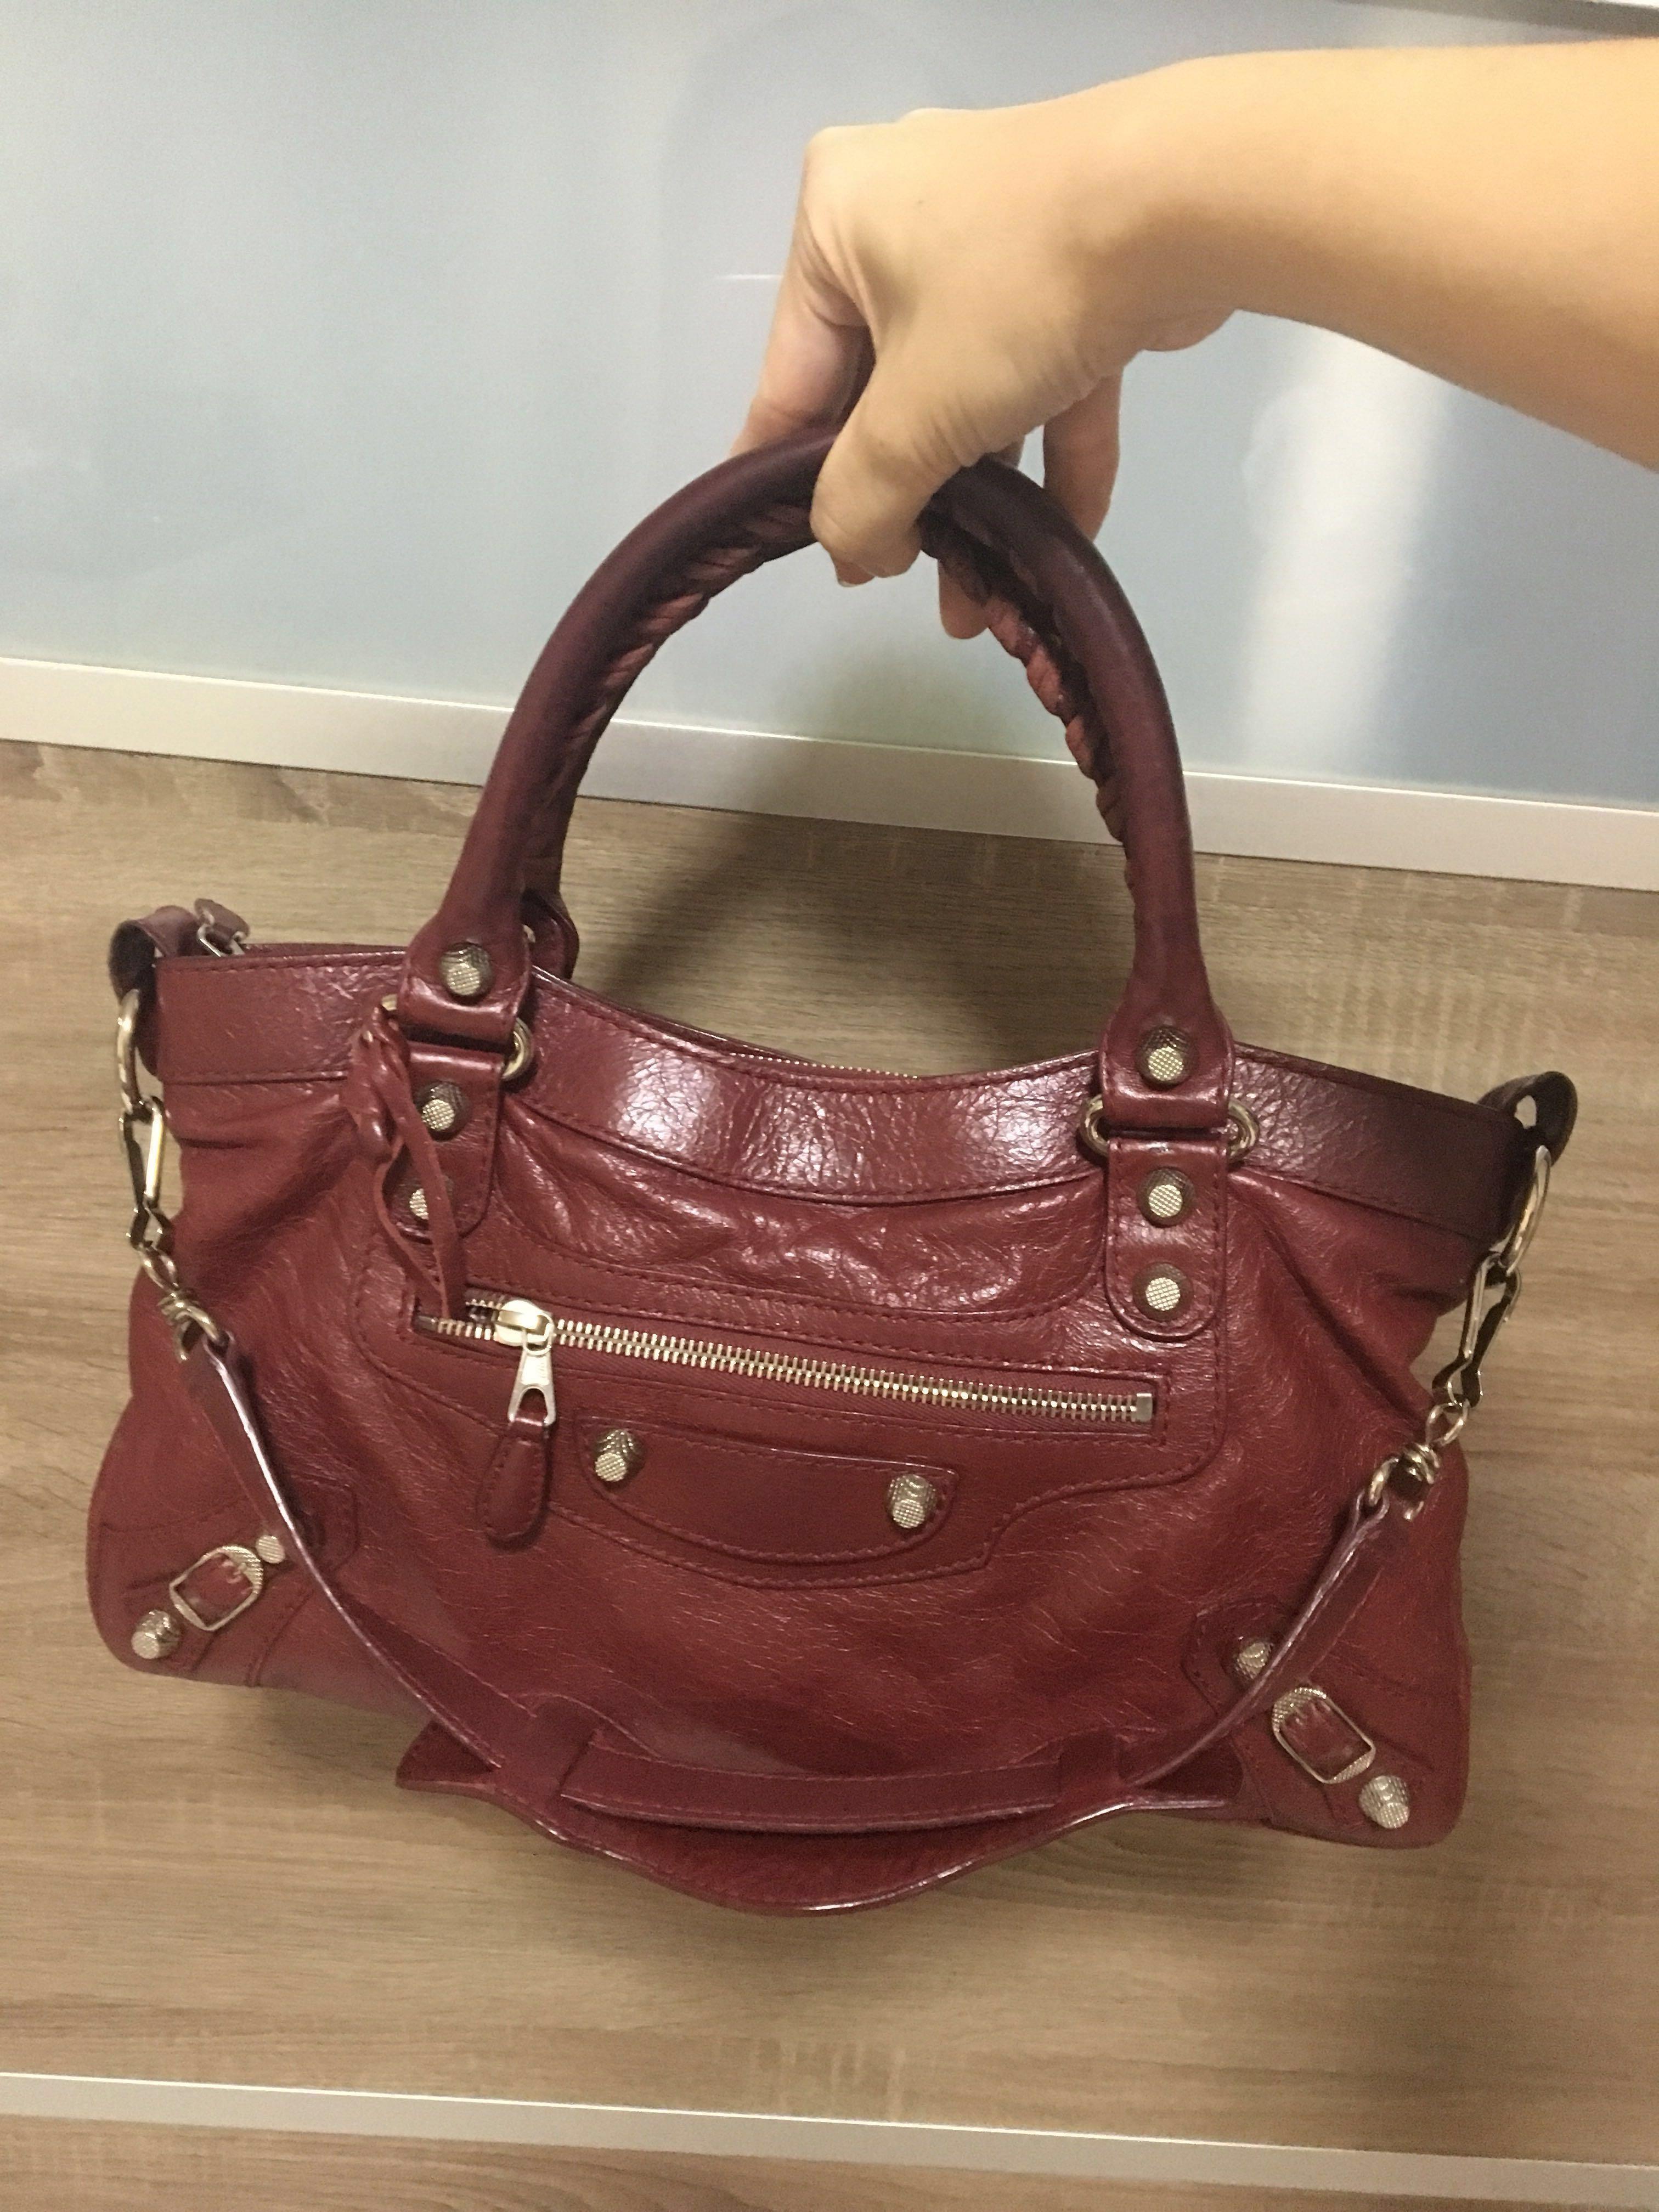 edde114b53 PRICE REDUCED - Balenciaga Classic First City bag, Women's Fashion, Bags &  Wallets, Handbags on Carousell